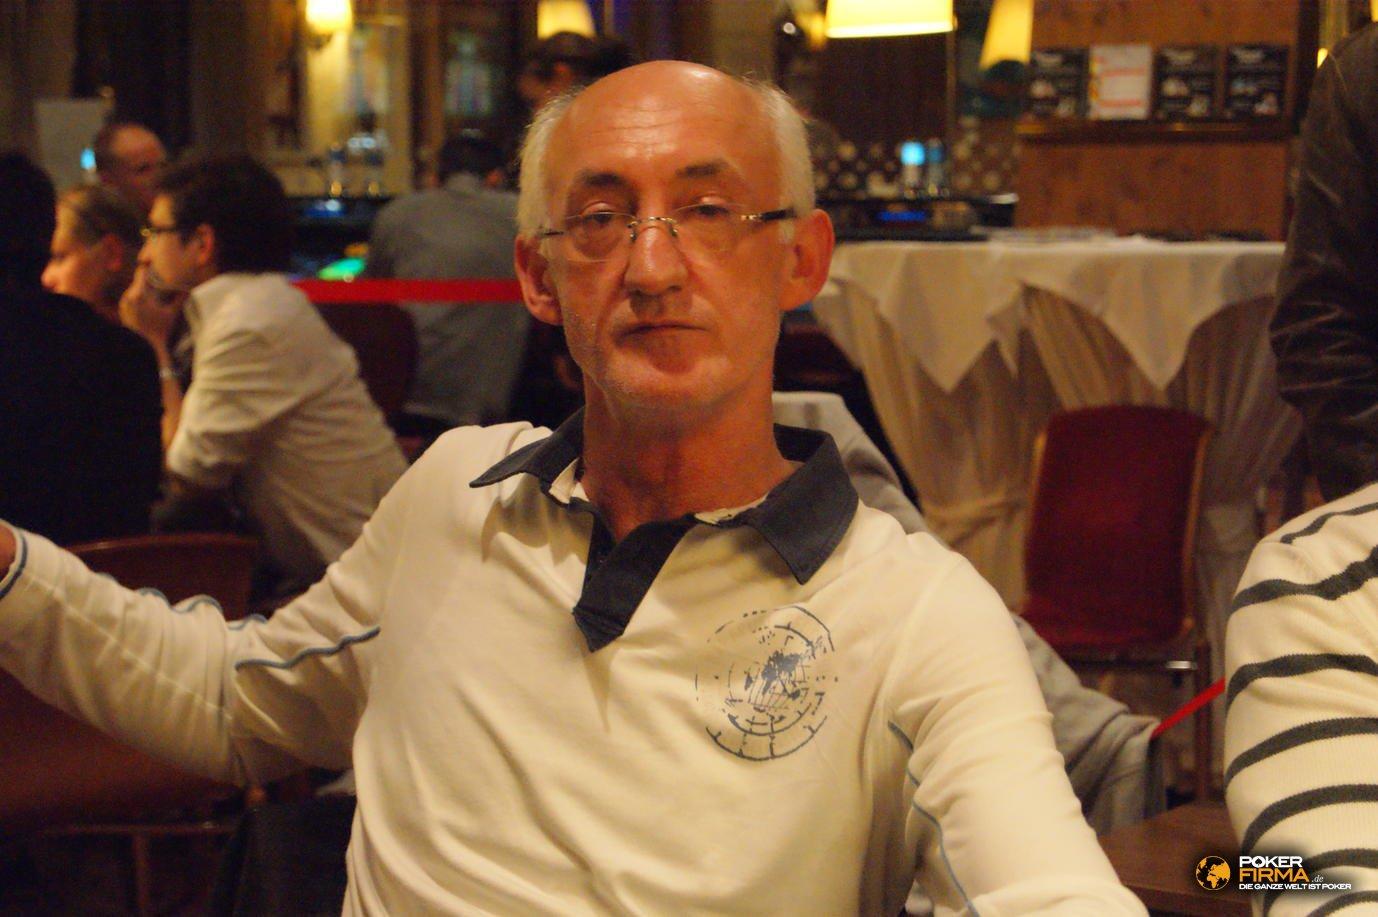 Mountain_Poker_Party_1500_NLH_FT_081011_Vlado_Sevo